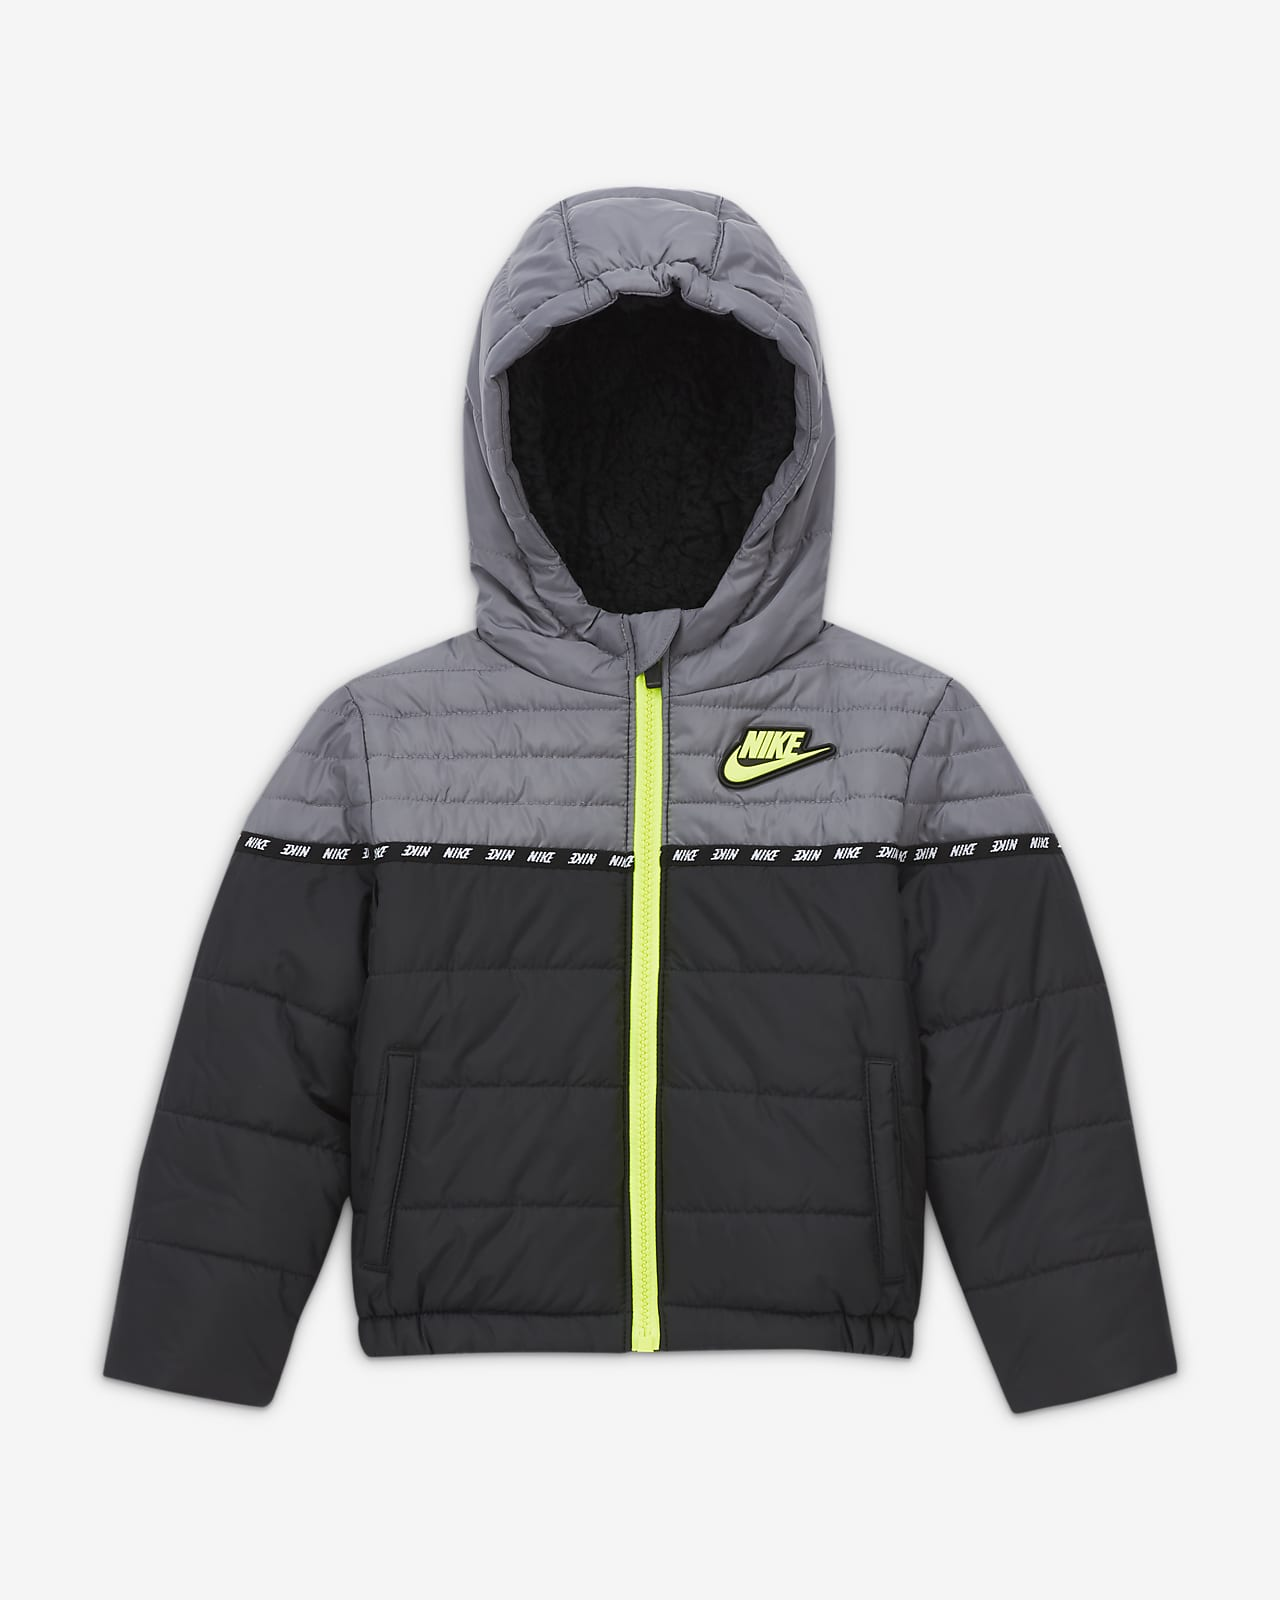 Nike Chaqueta acolchada - Bebé (12-24M)